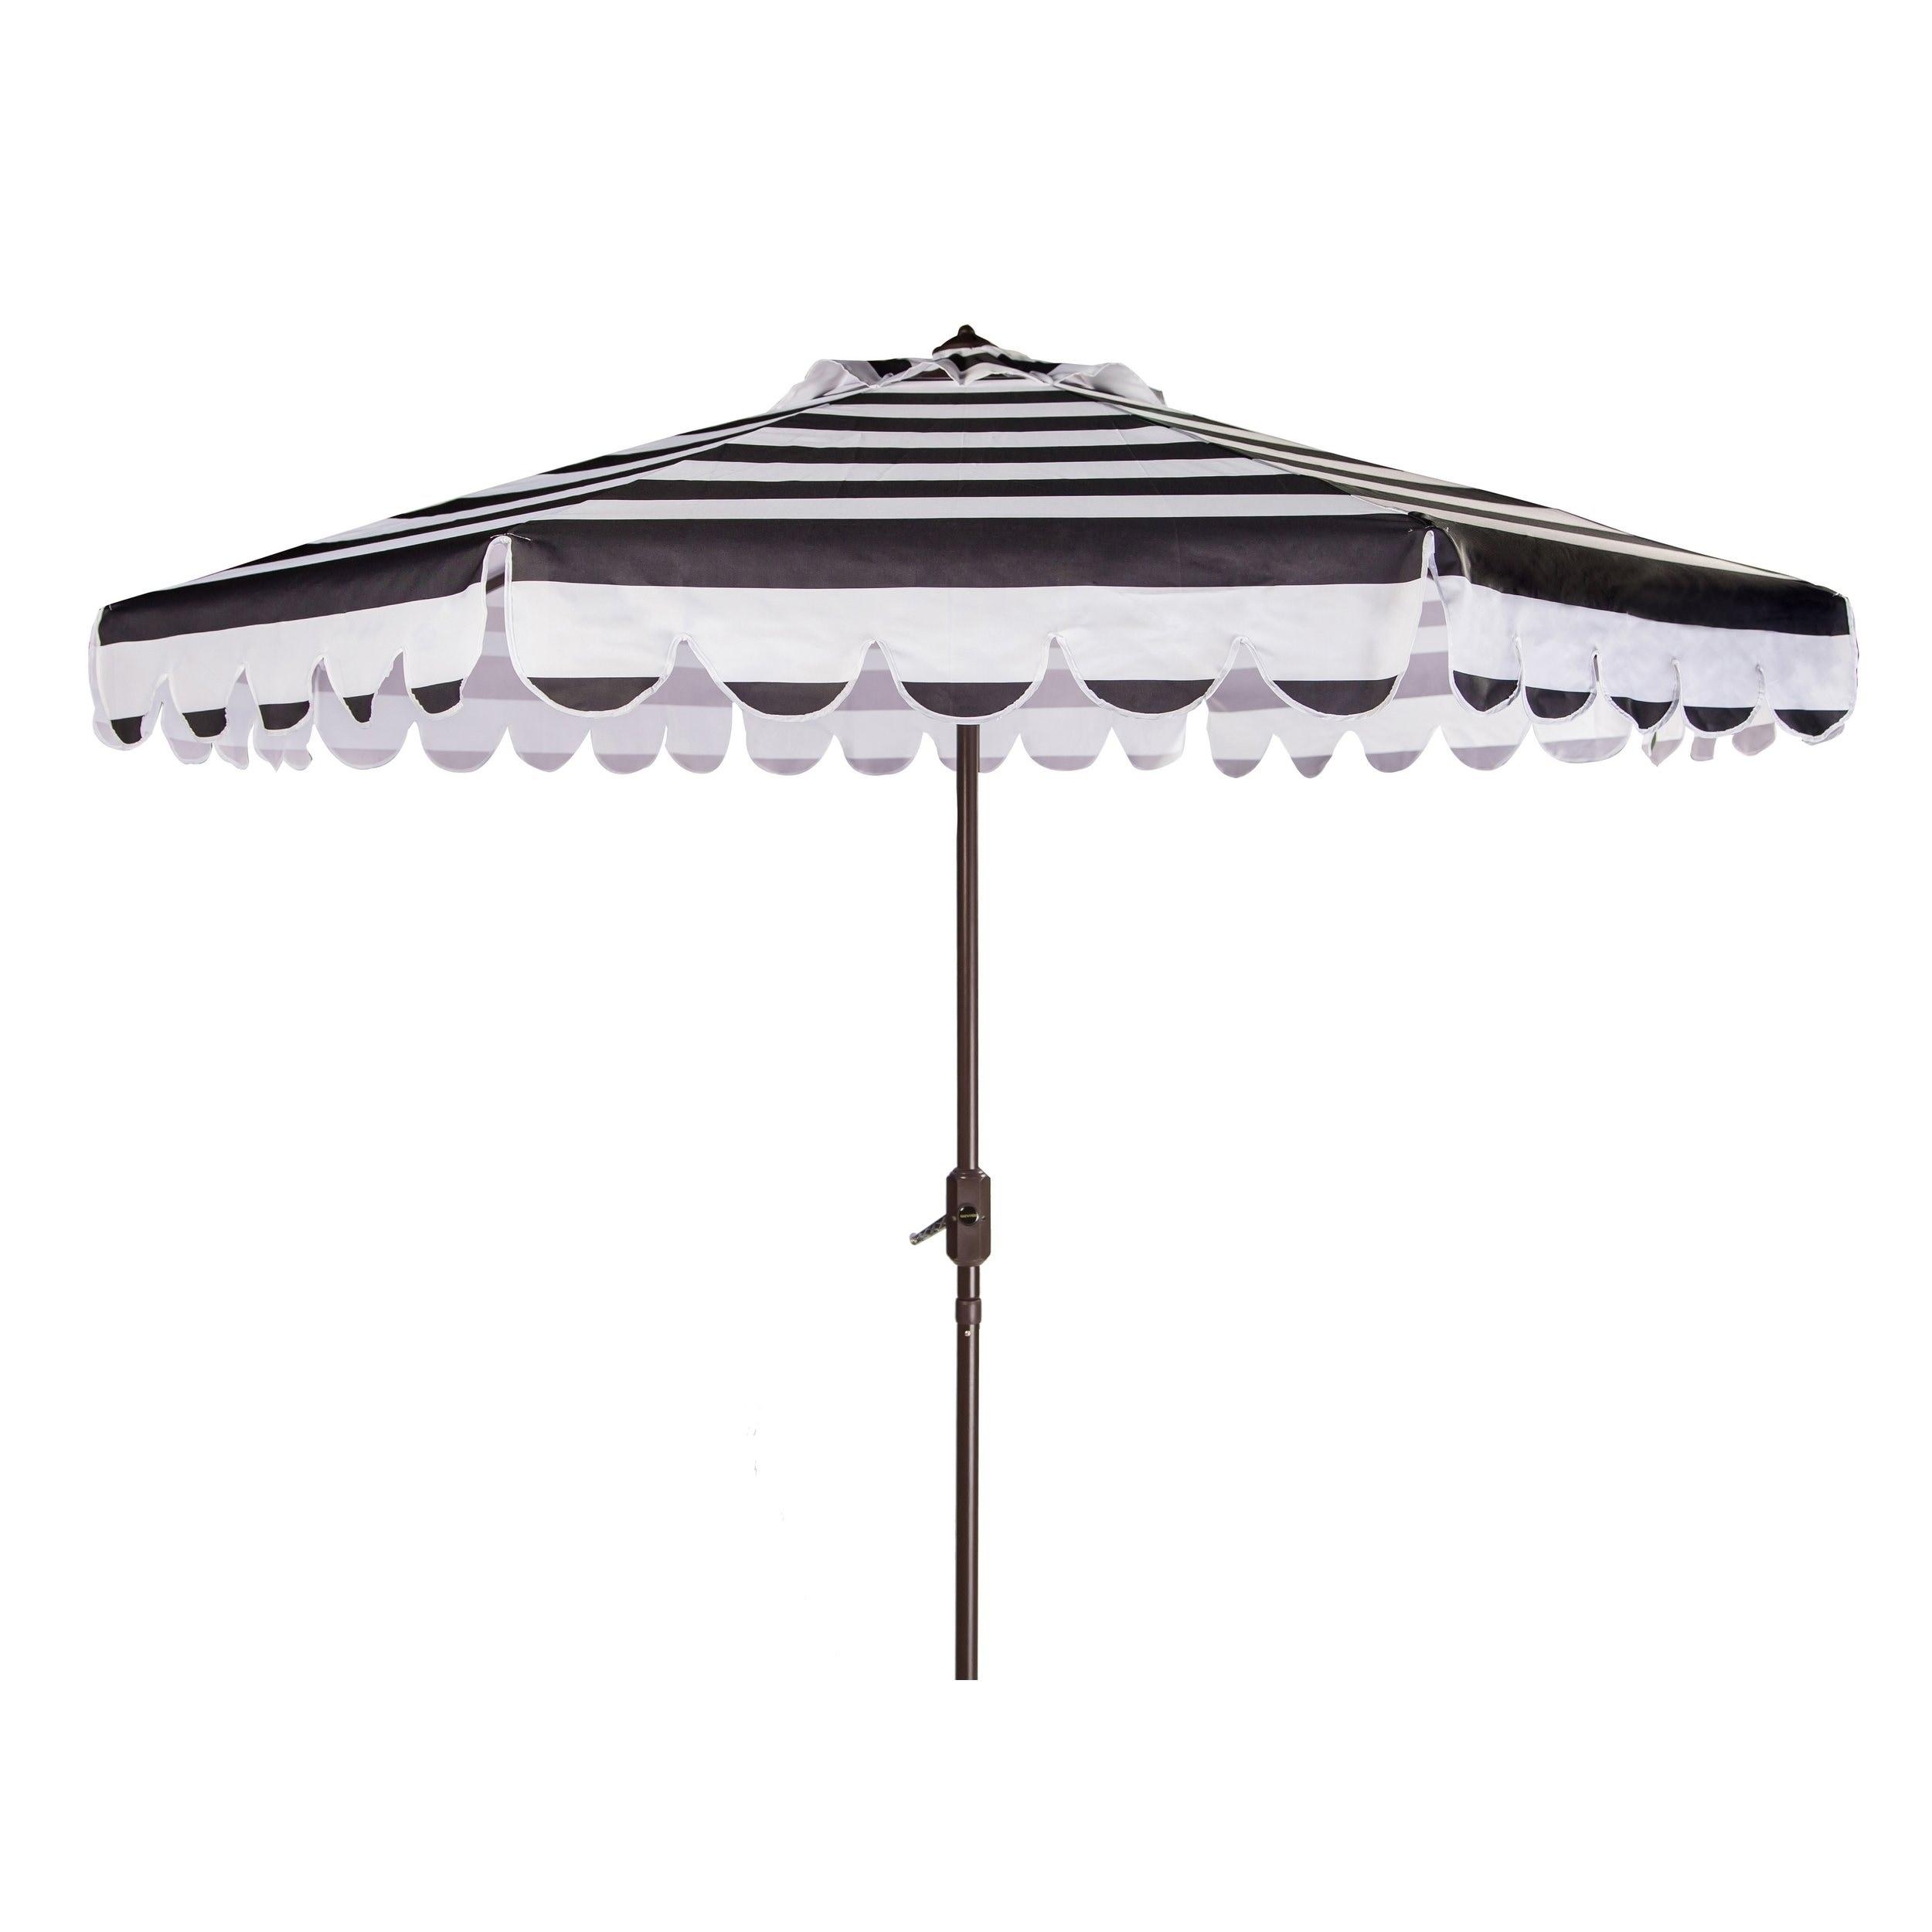 Safavieh Maui Single Scallop Striped 9 Ft Black White Crank Umbrella On Free Shipping Today 14586635